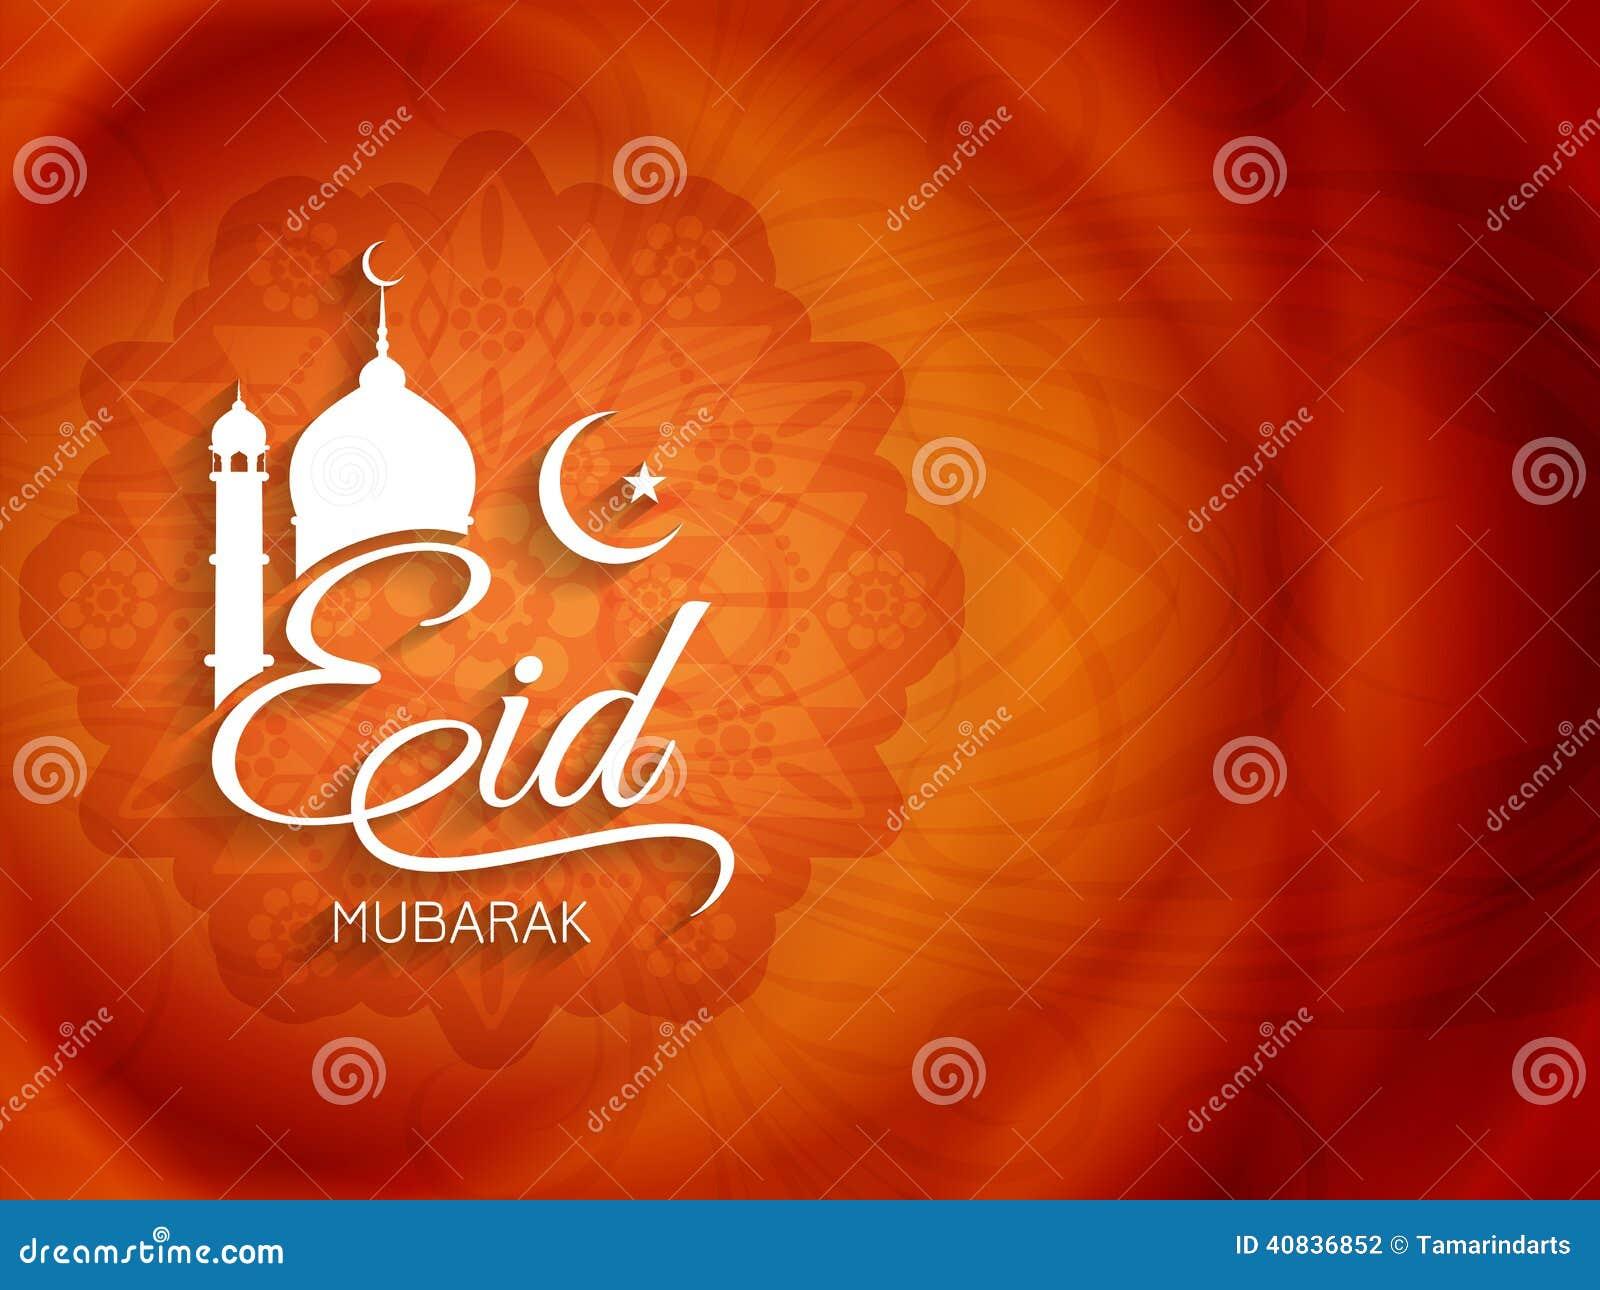 Artistic Eid Mubarak text design background